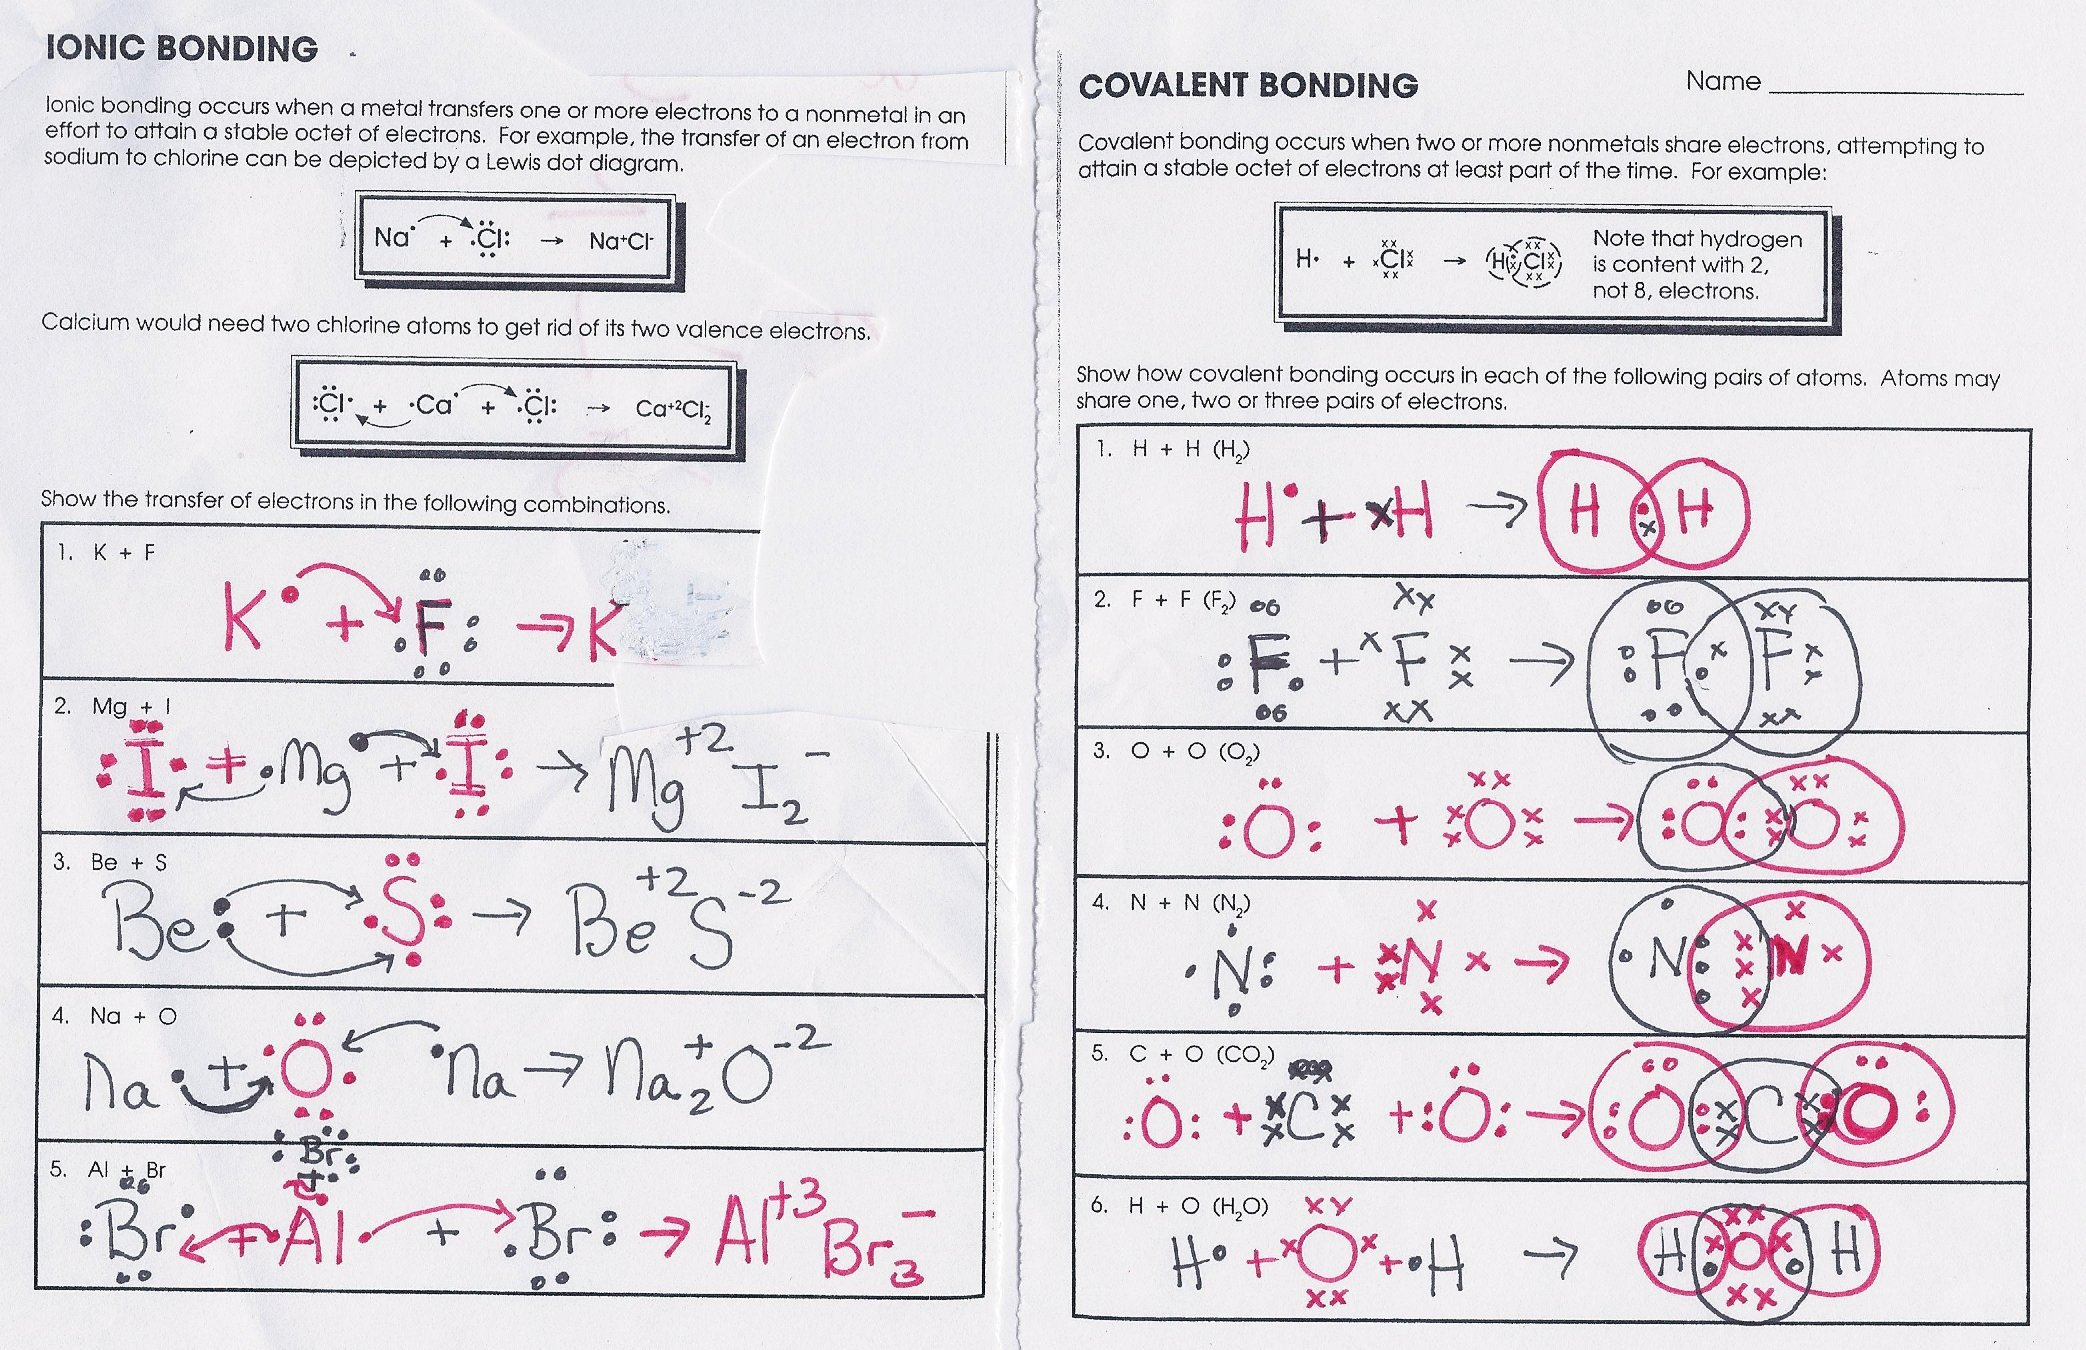 Atomic Bonding Worksheet The Best Worksheets Image Collection